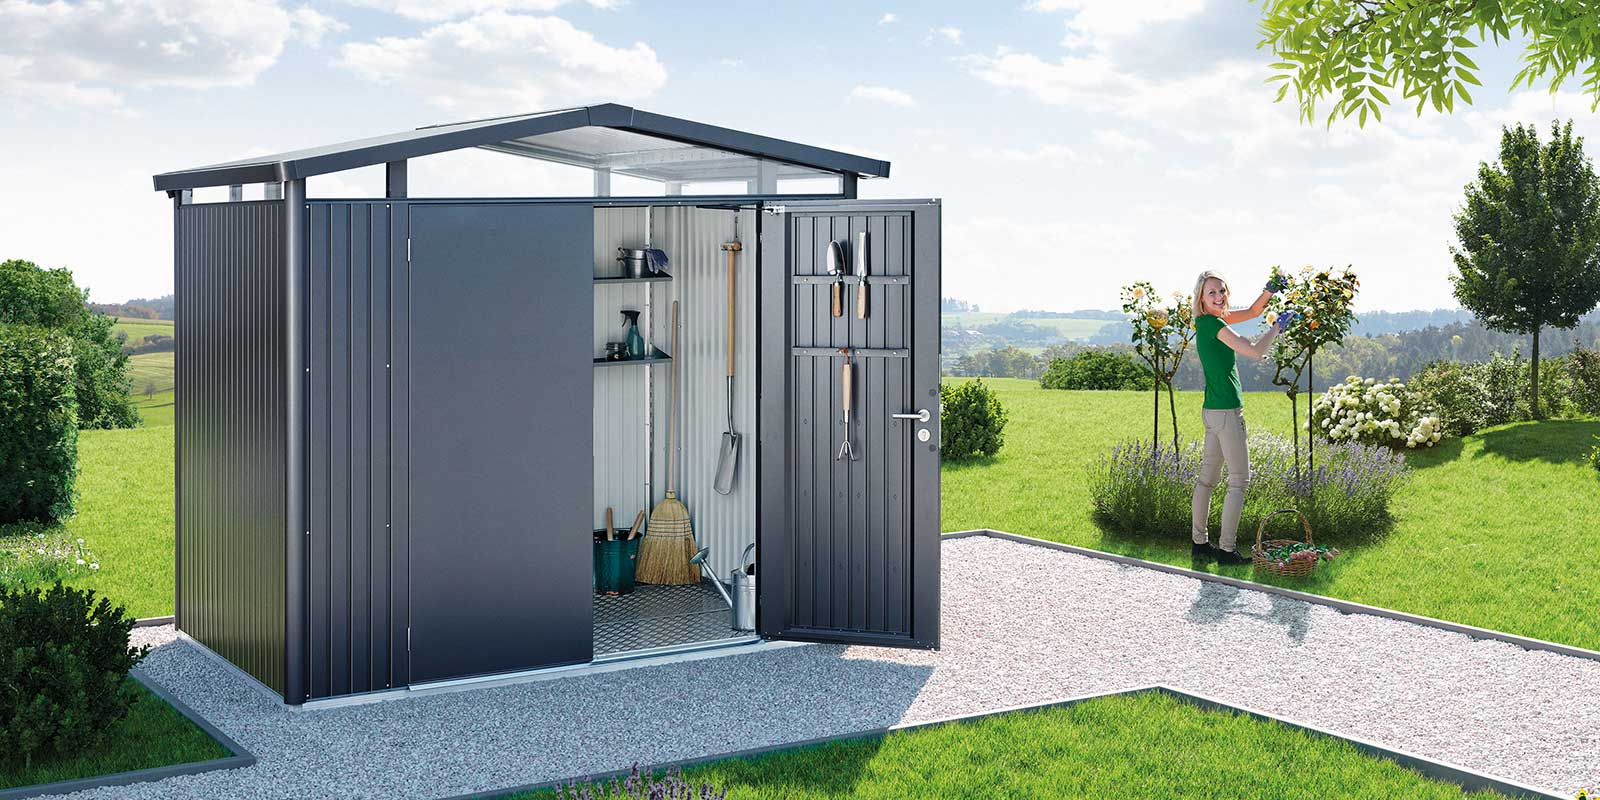 moderne ger teh user gartenh user und boxen aus metall. Black Bedroom Furniture Sets. Home Design Ideas